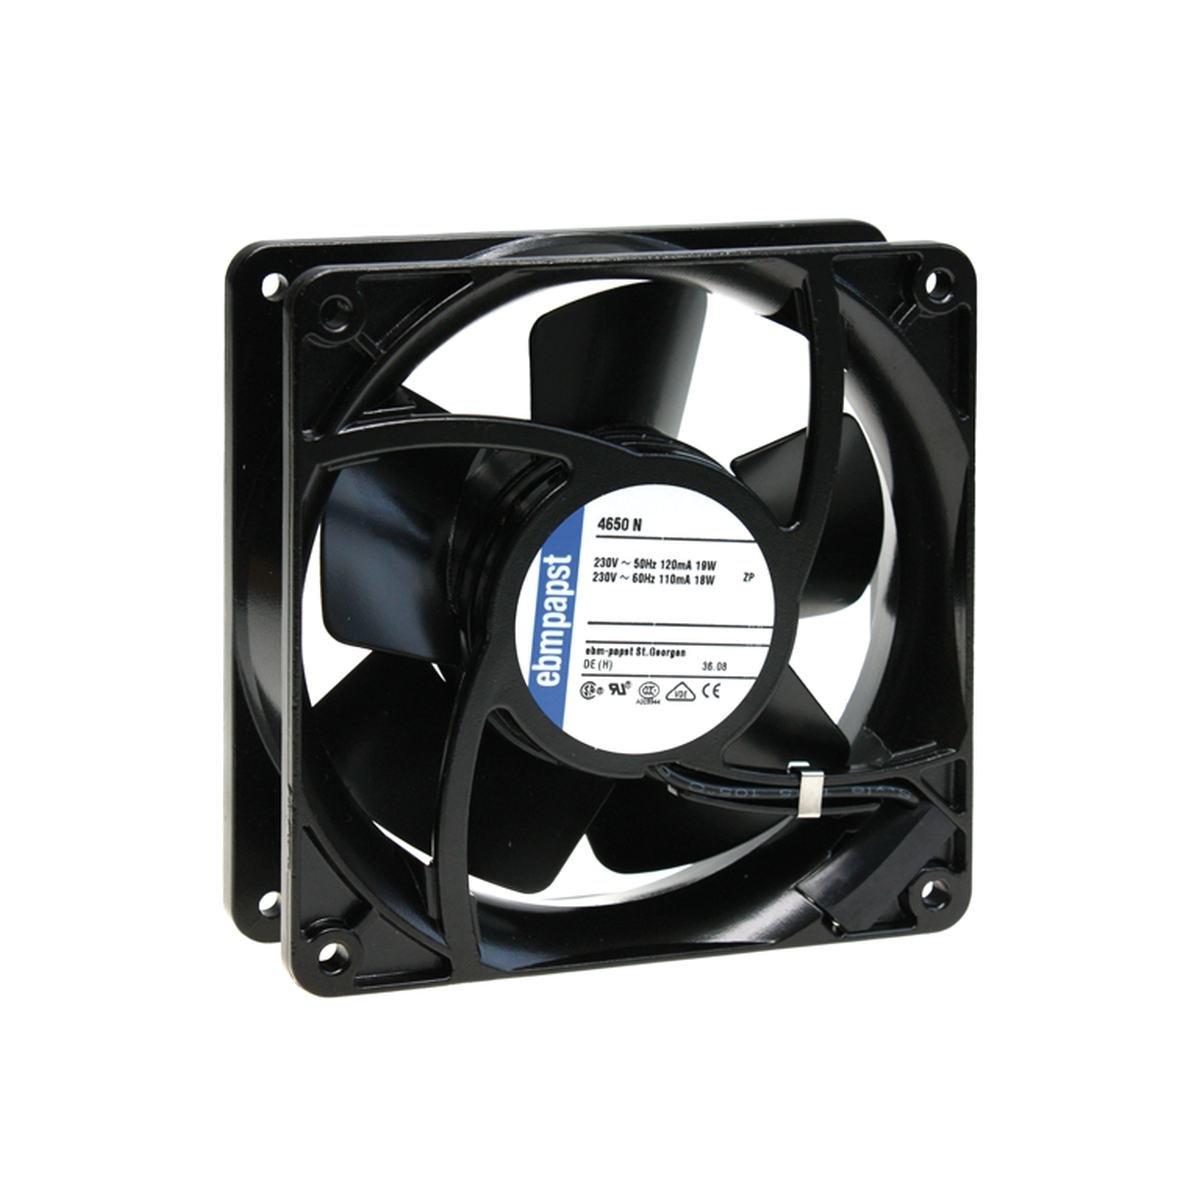 Axial ventilator - Pabst 4650N